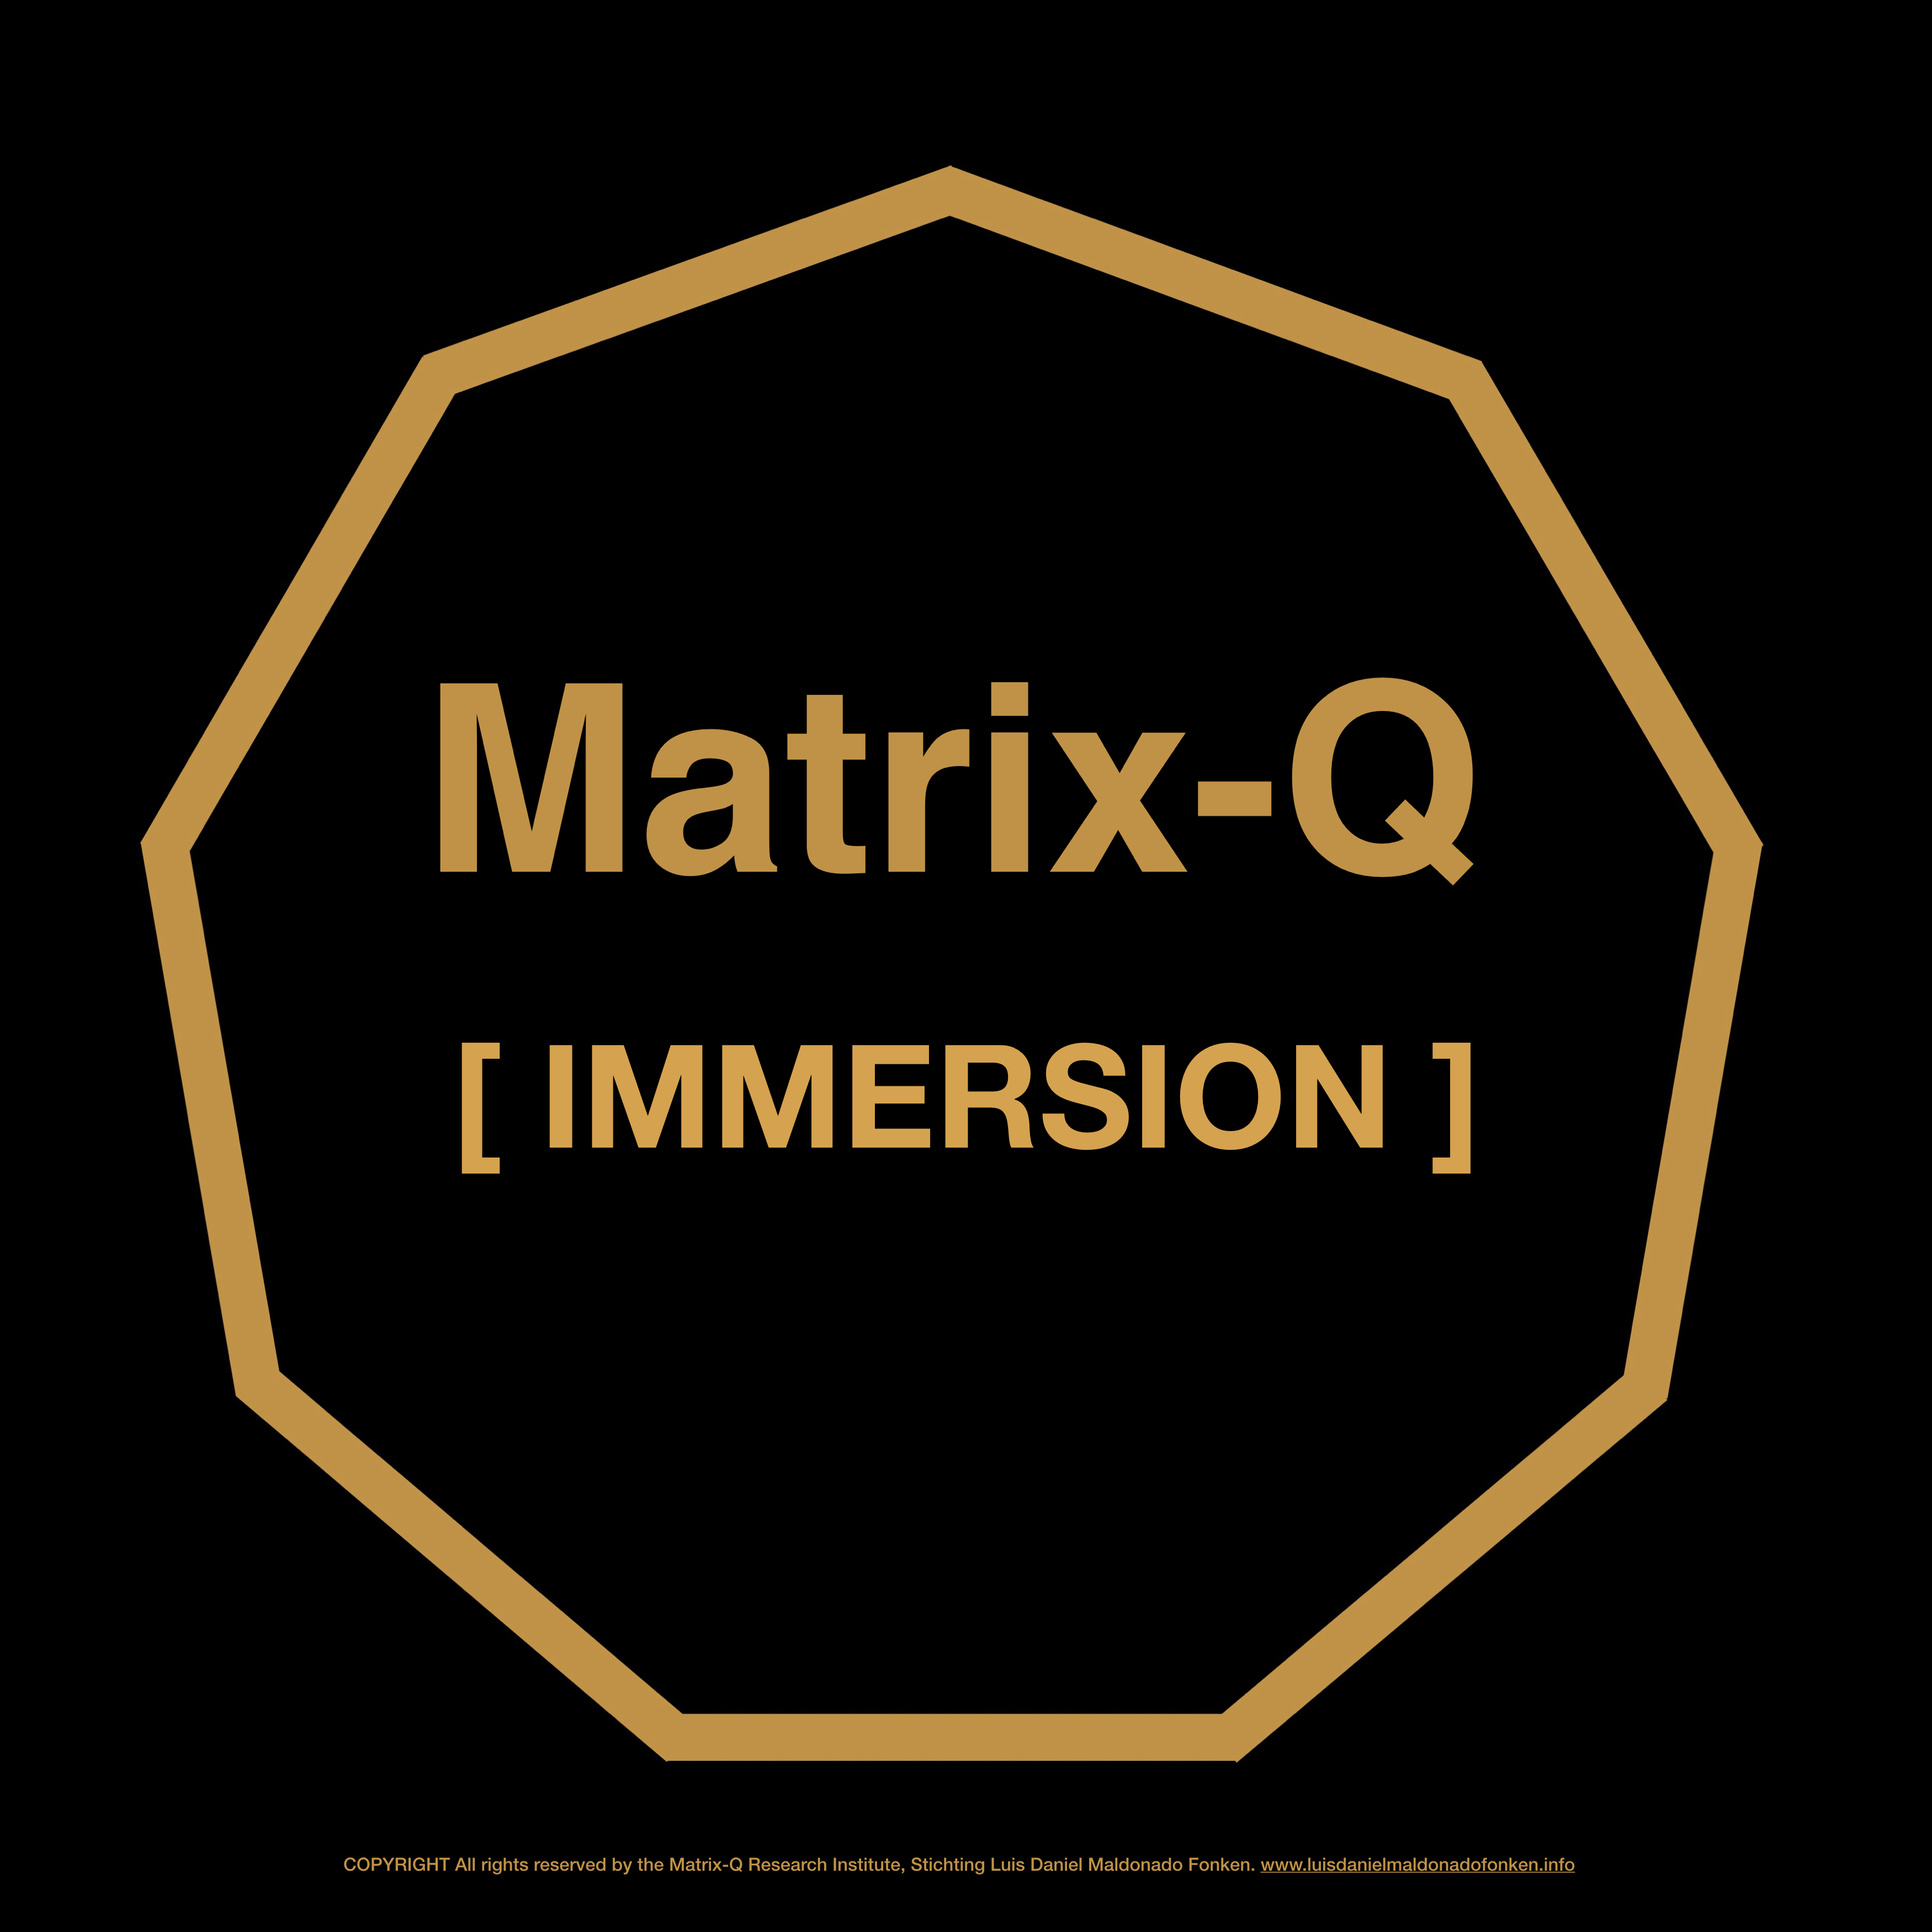 Matrix-Q Board Members – Immersion – The Matrix-Q SDG Bank